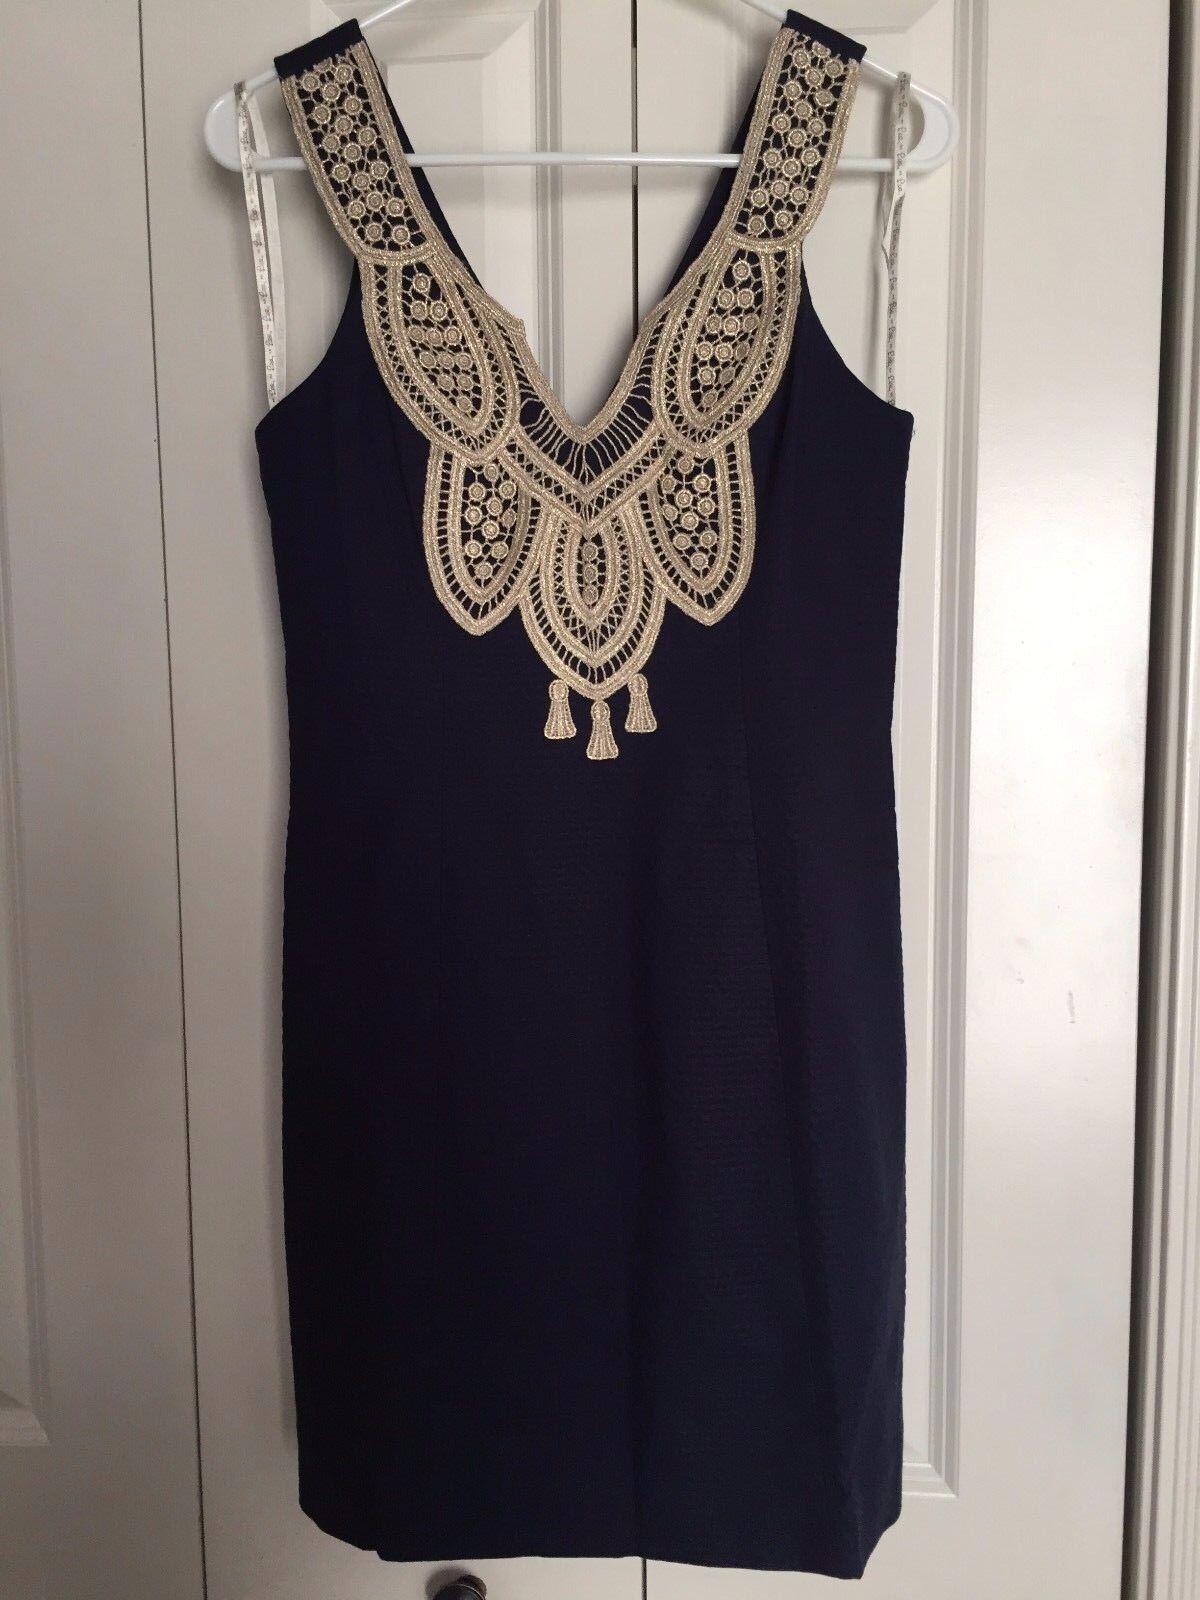 BRAND NEW LILLY PULITZER WOMEN'S LARGO SHIFT DRESS DRESS DRESS Style  25094 SIZE 8 Navy 854369